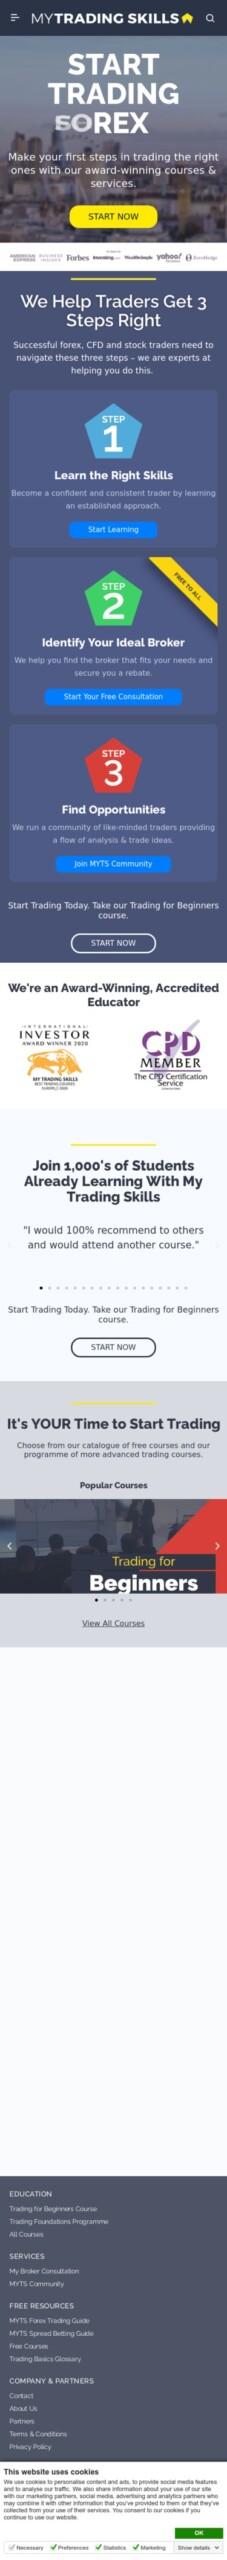 My Trading Skills Coupon